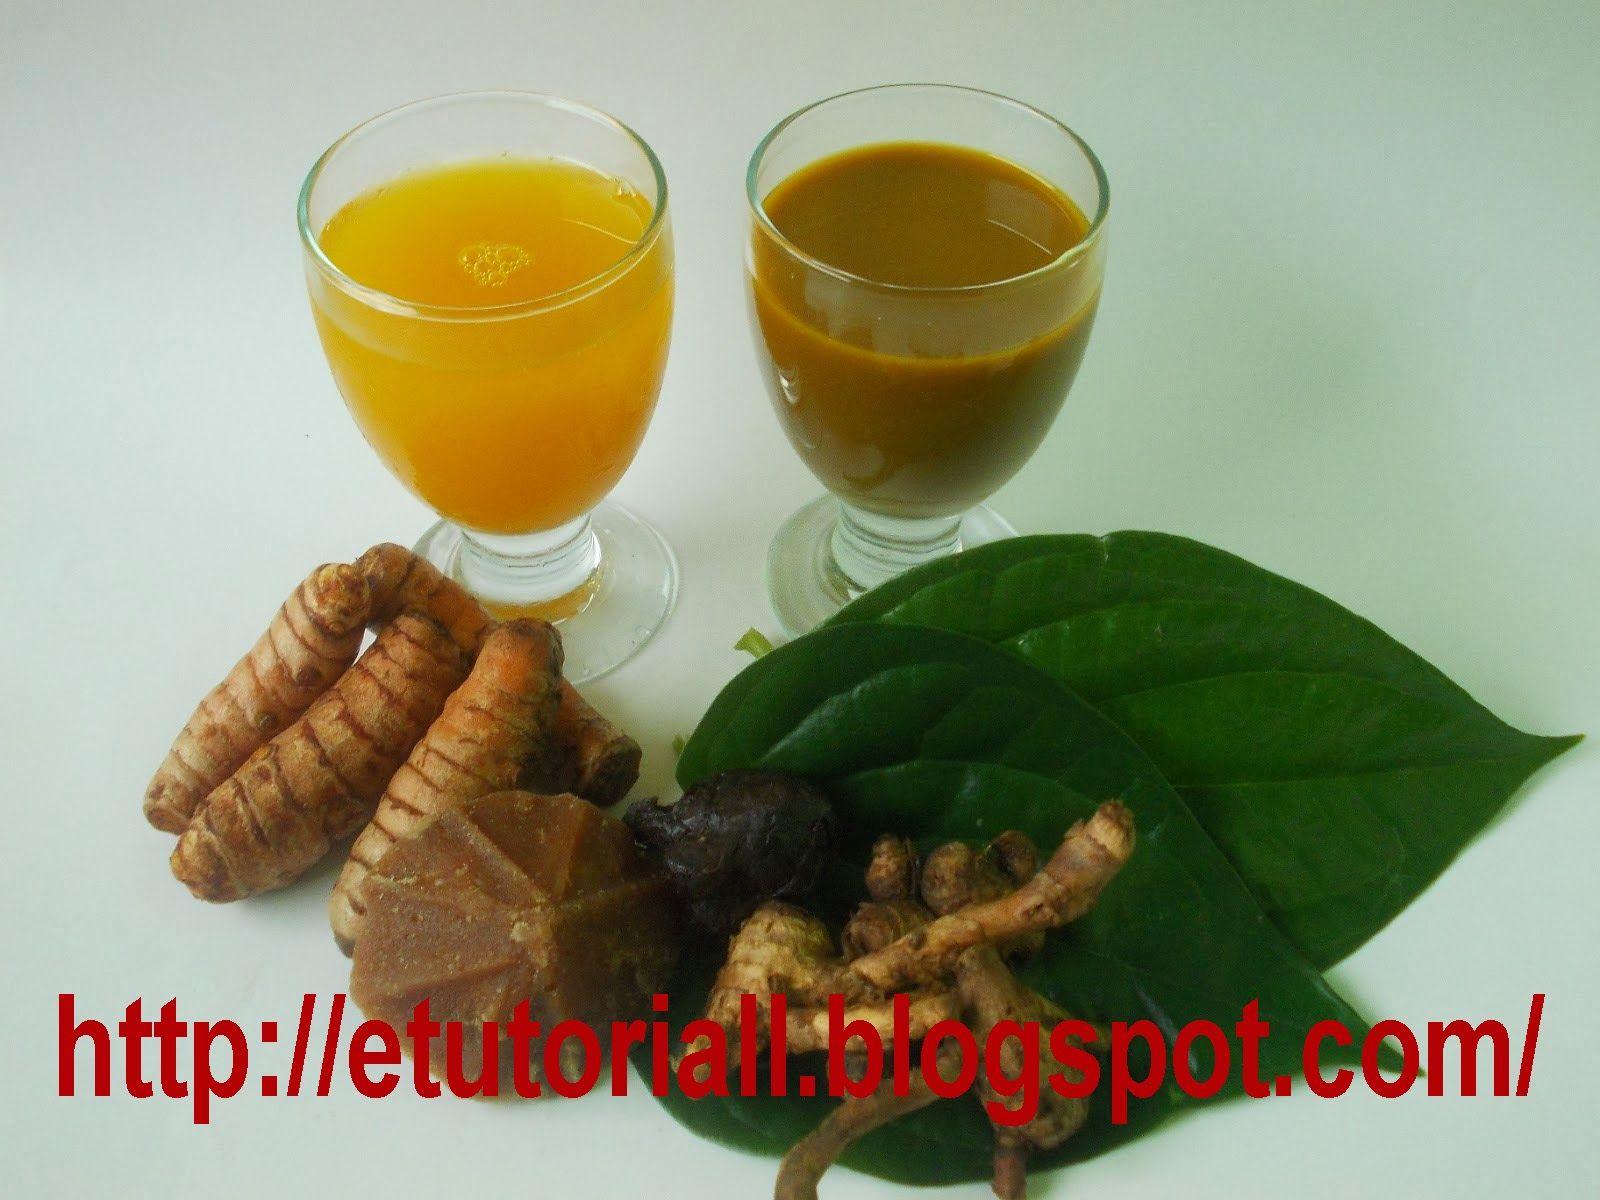 Resep Jamu Kunyit Asam Kunyit Makanan Dan Minuman Minuman Sehat